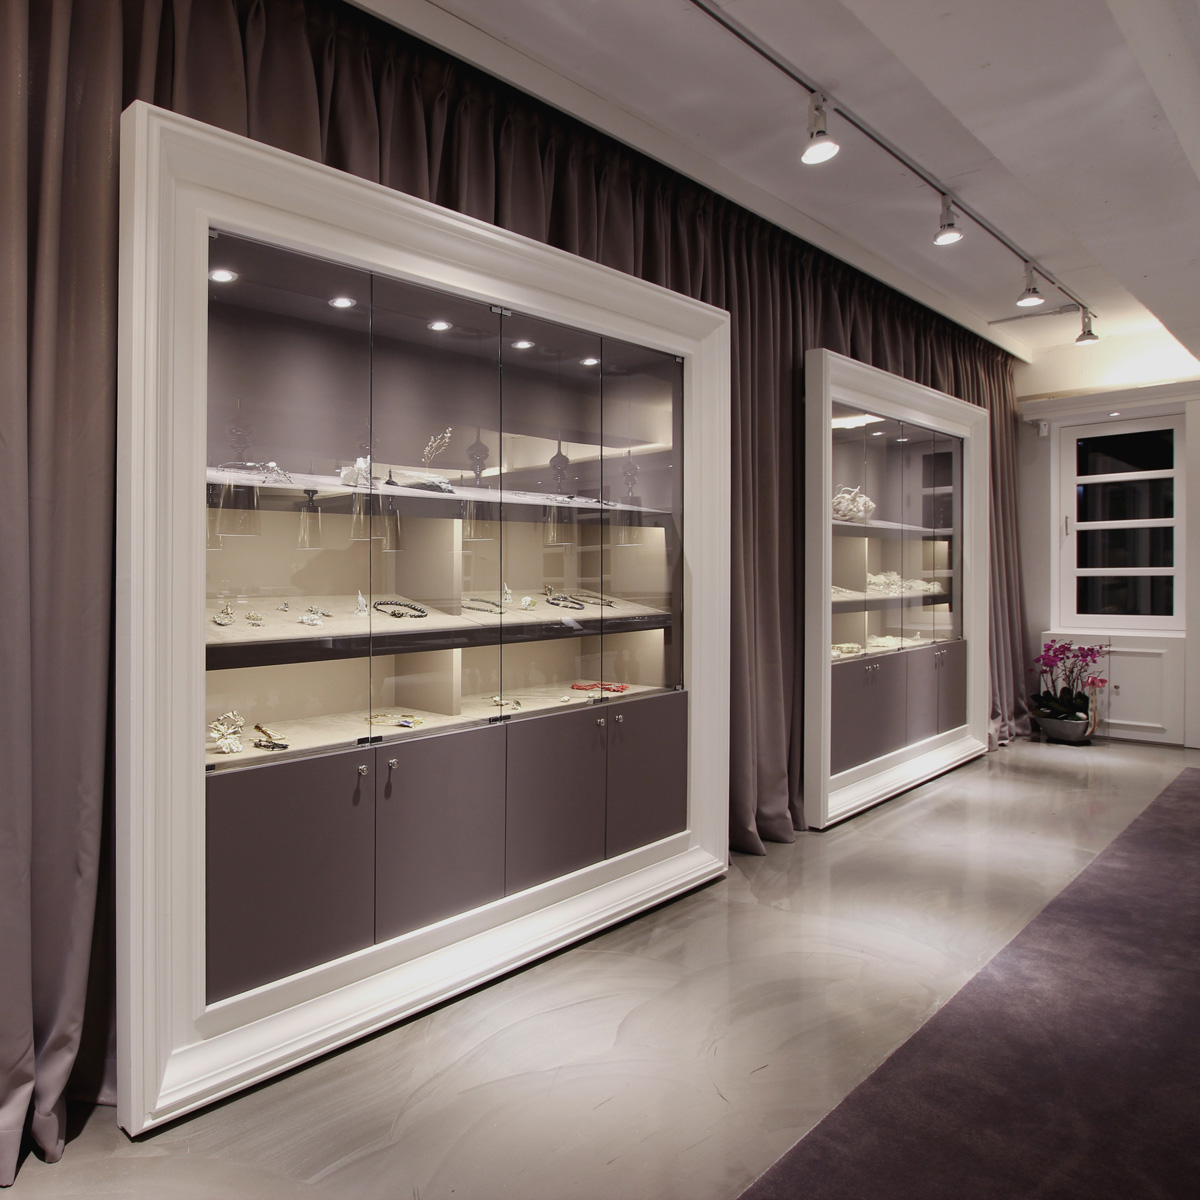 hjl studio - Mond Jewelry Boutique 06.jpg